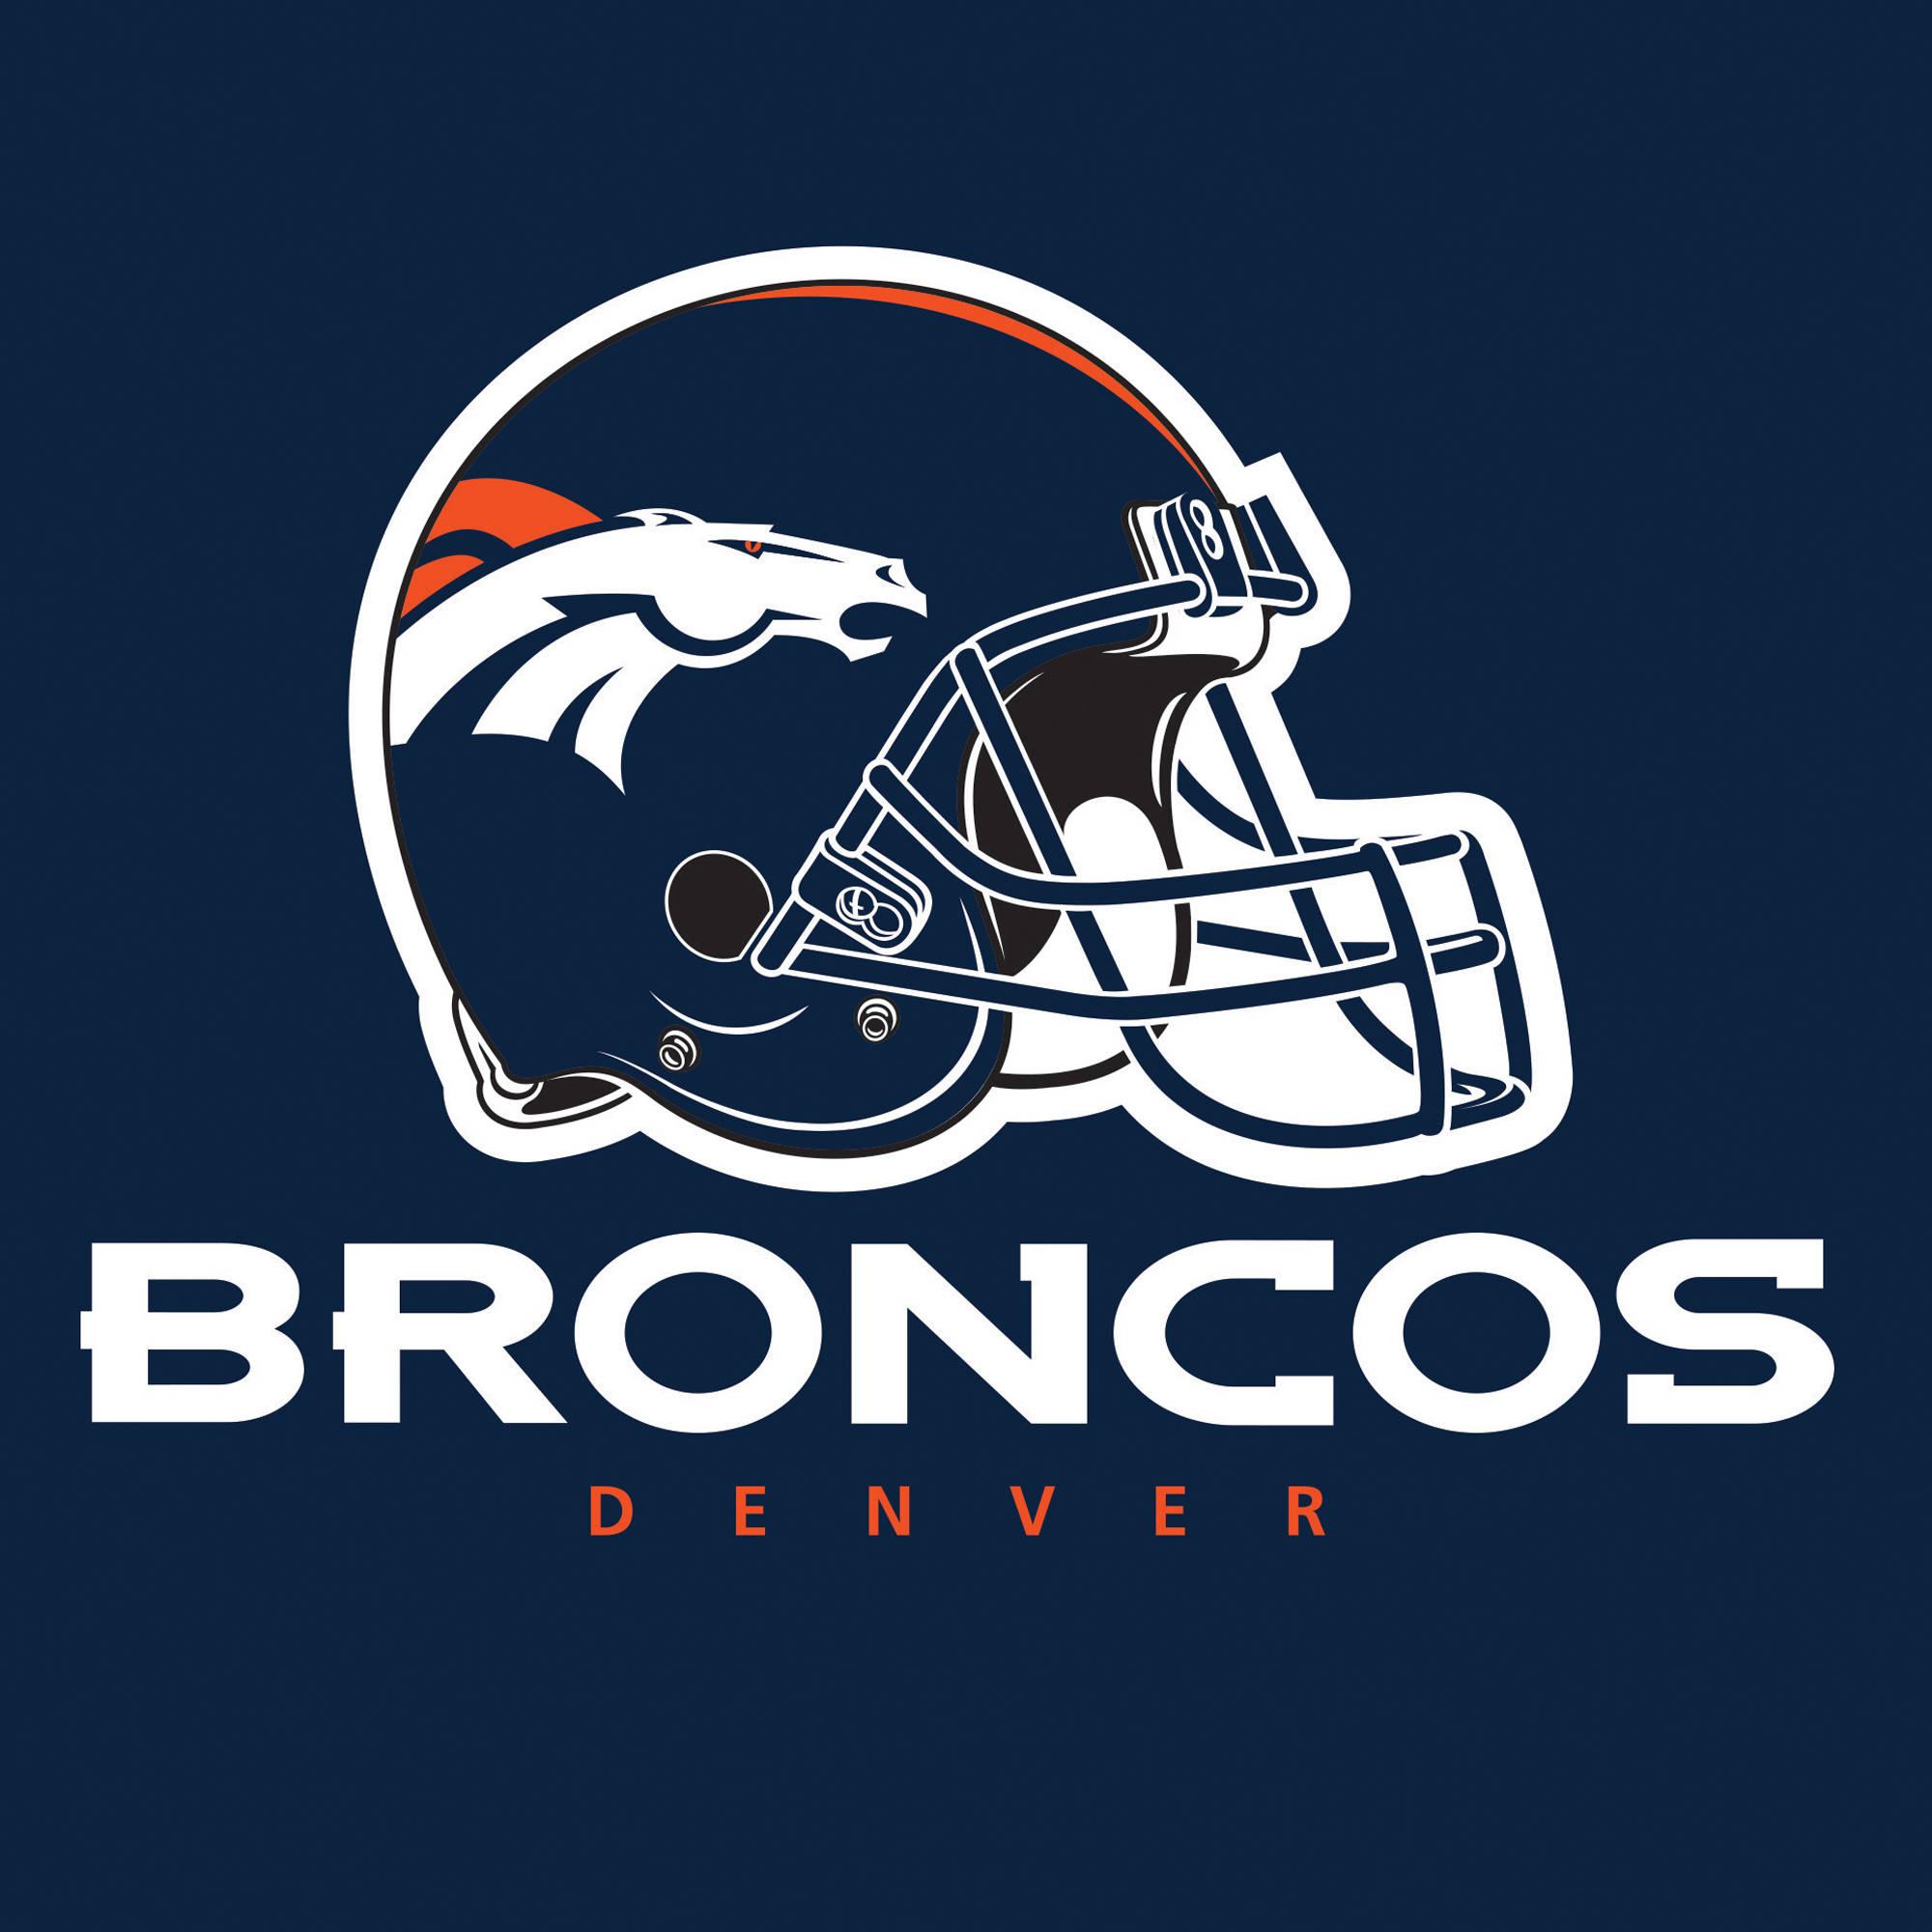 2000x2000 > Denver Broncos Wallpapers